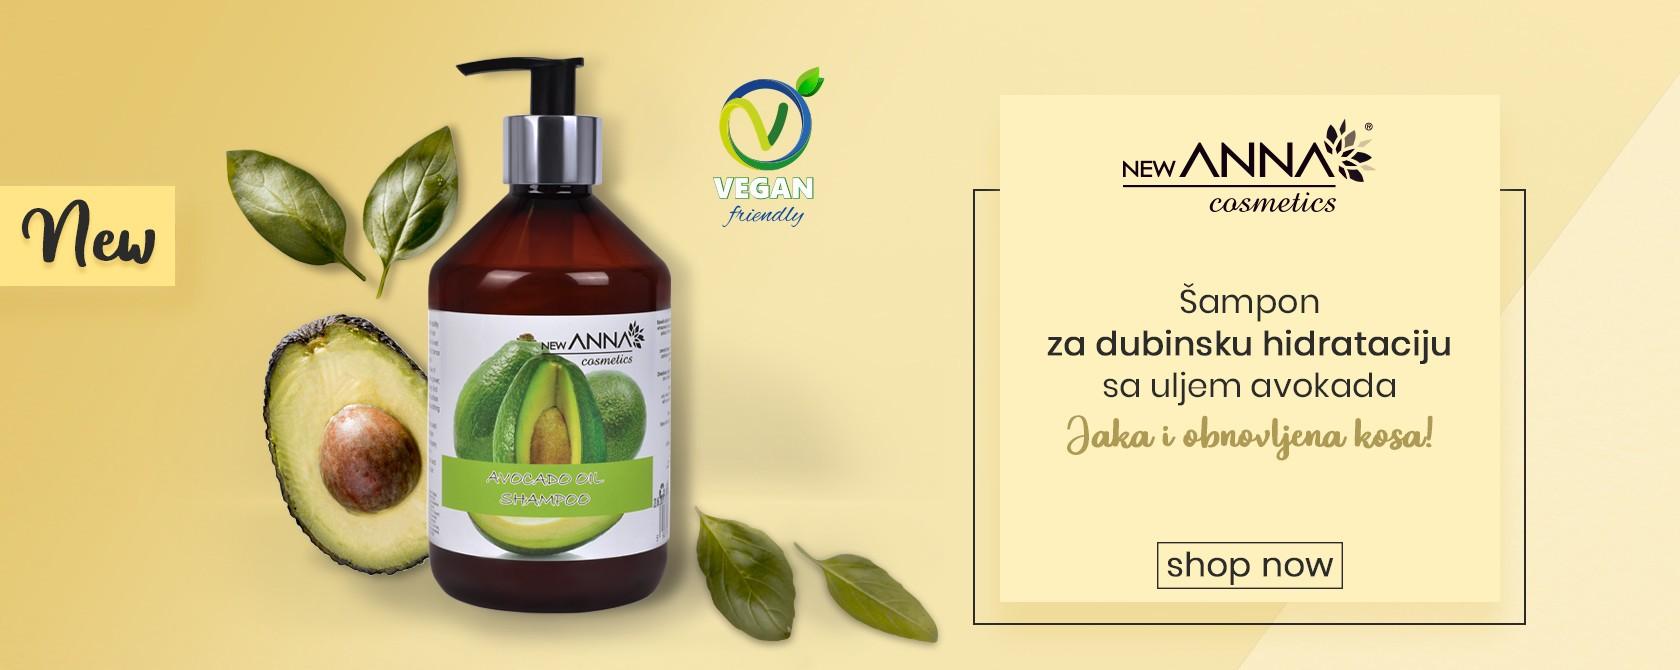 New Anna sampon avocado